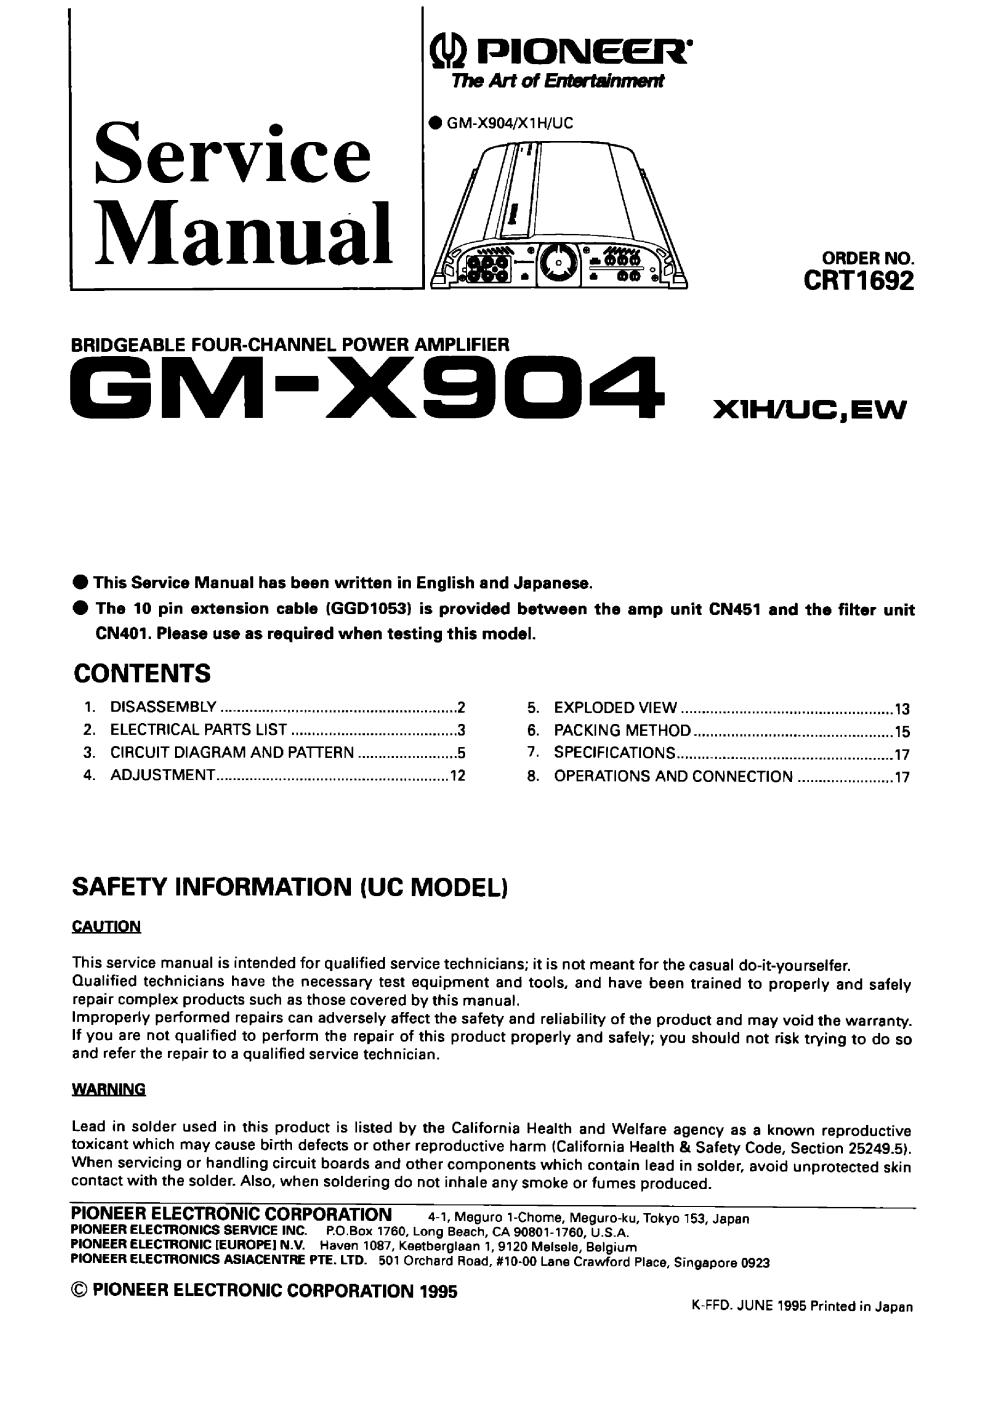 medium resolution of pioneer gm x944 service manual pdf download manualslib